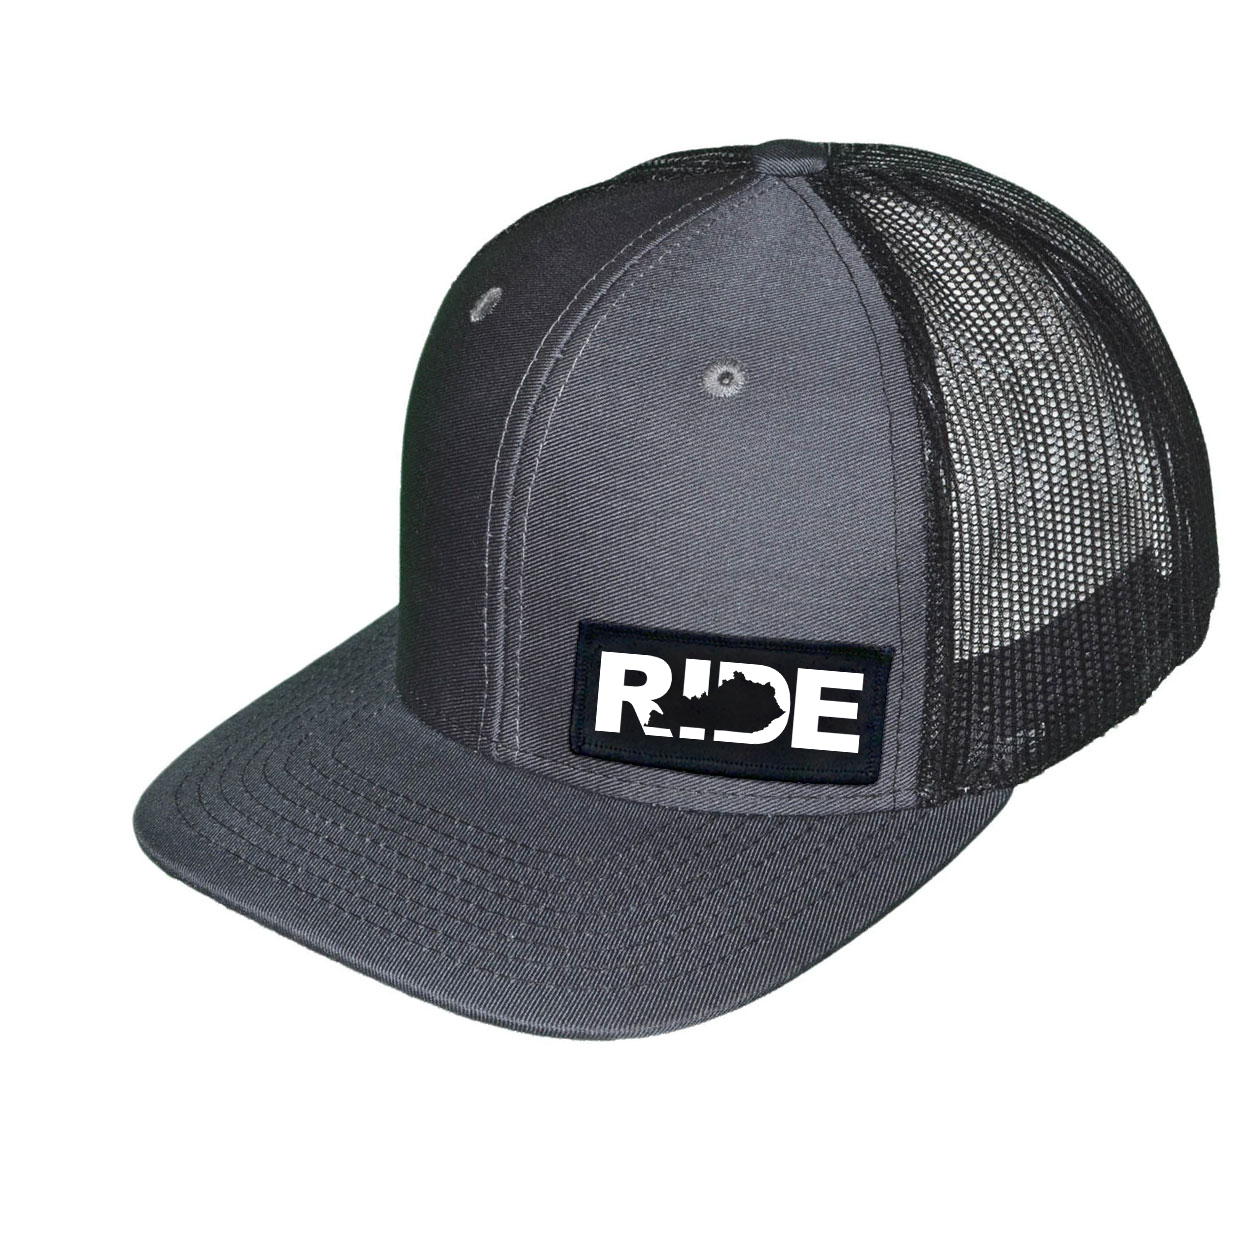 Ride Kentucky Night Out Woven Patch Snapback Trucker Hat Dark Gray/Black (White Logo)